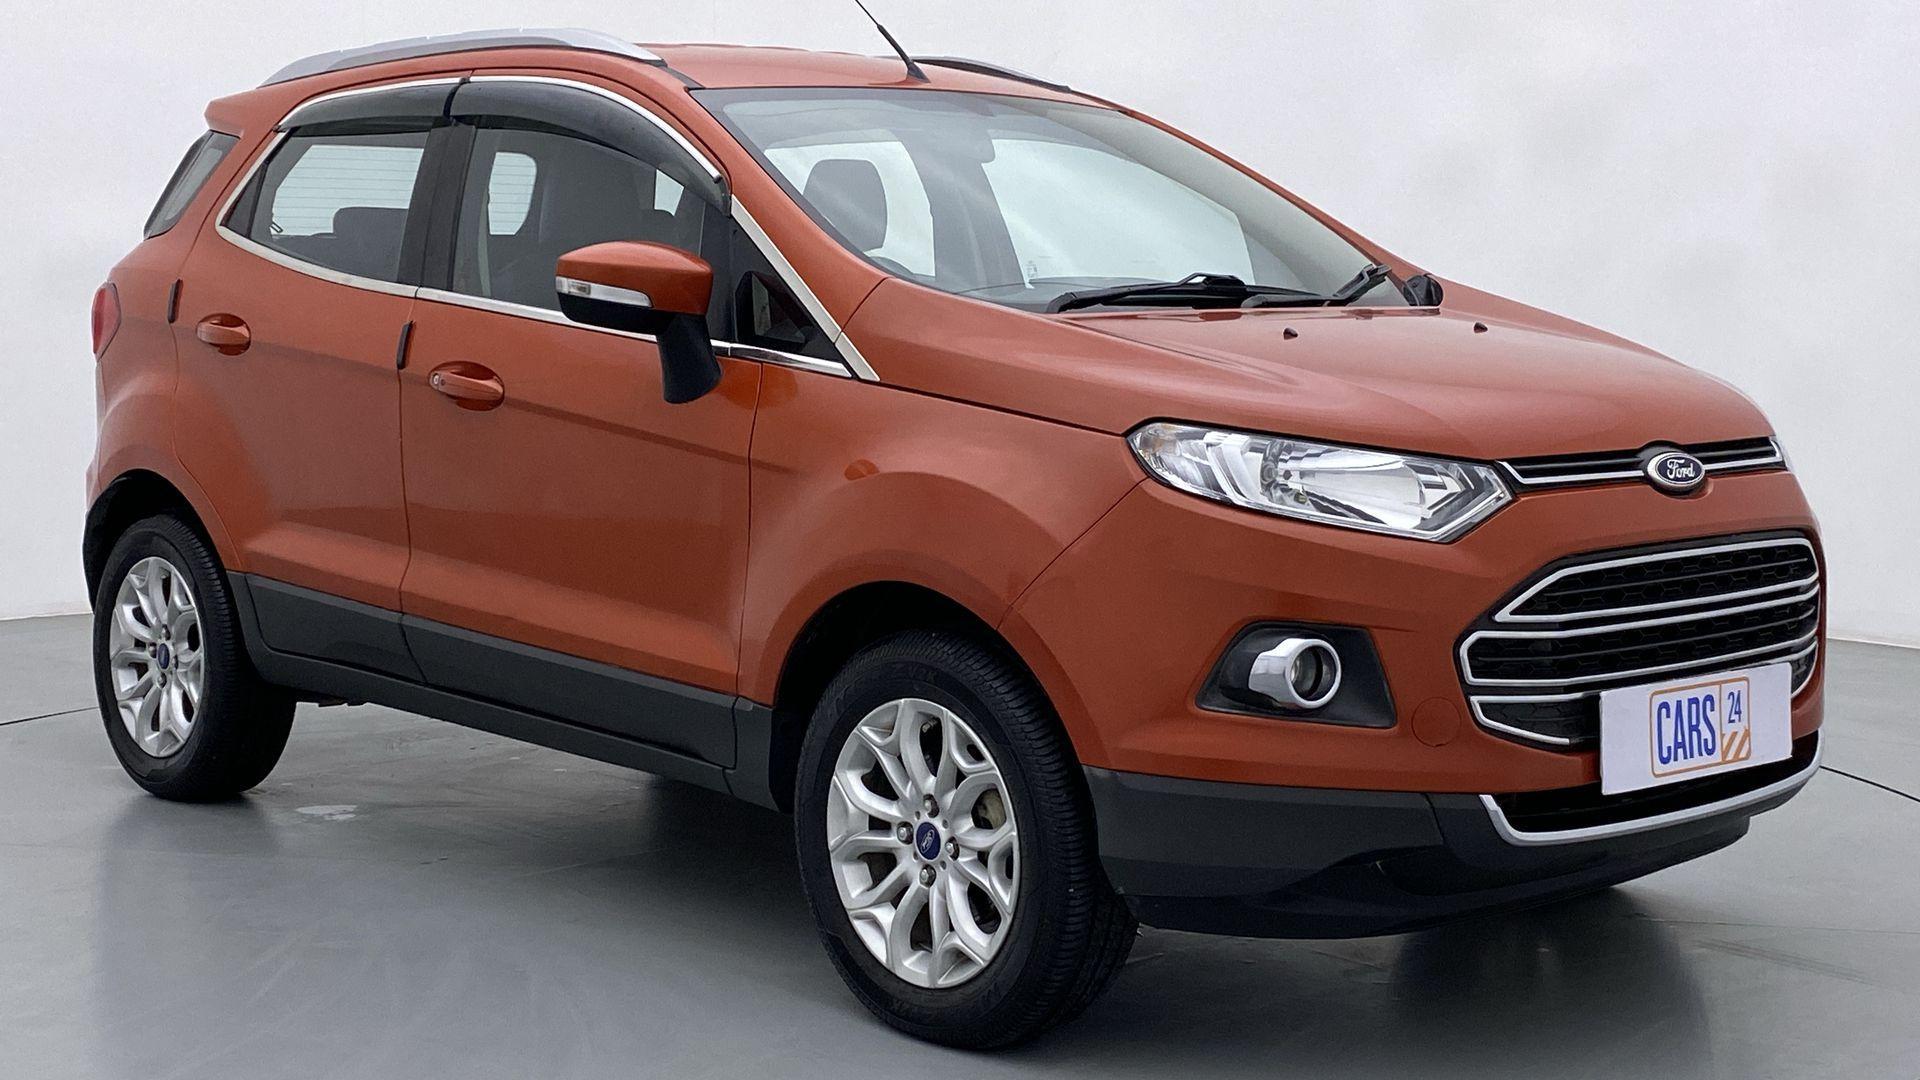 2014 Ford Ecosport 1.5 TITANIUMTDCI OPT